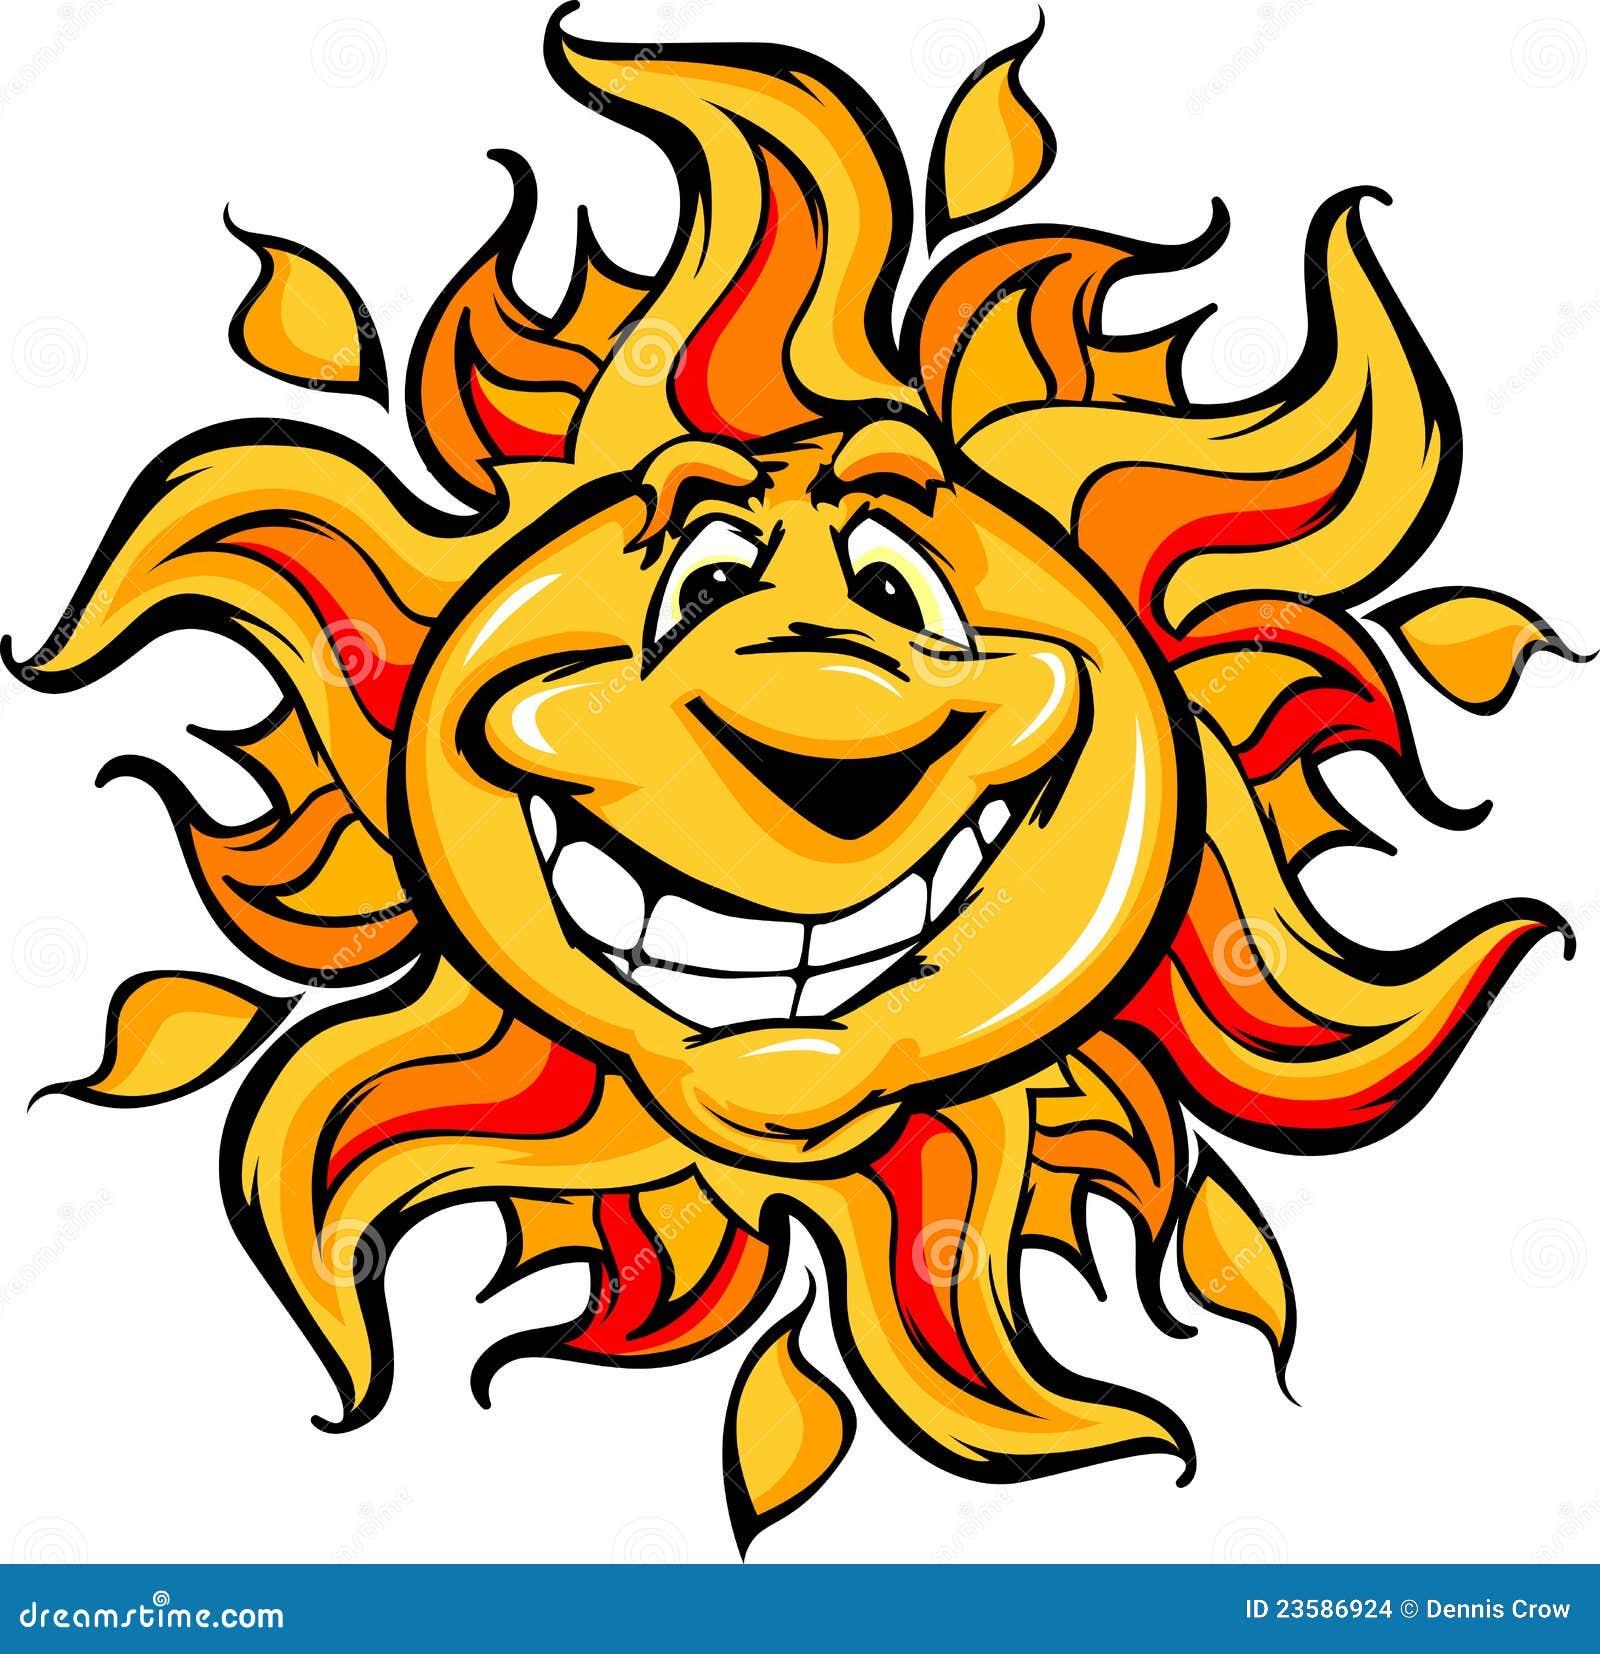 Happy Sun Cartoon with a Big Big Cartoon Smile